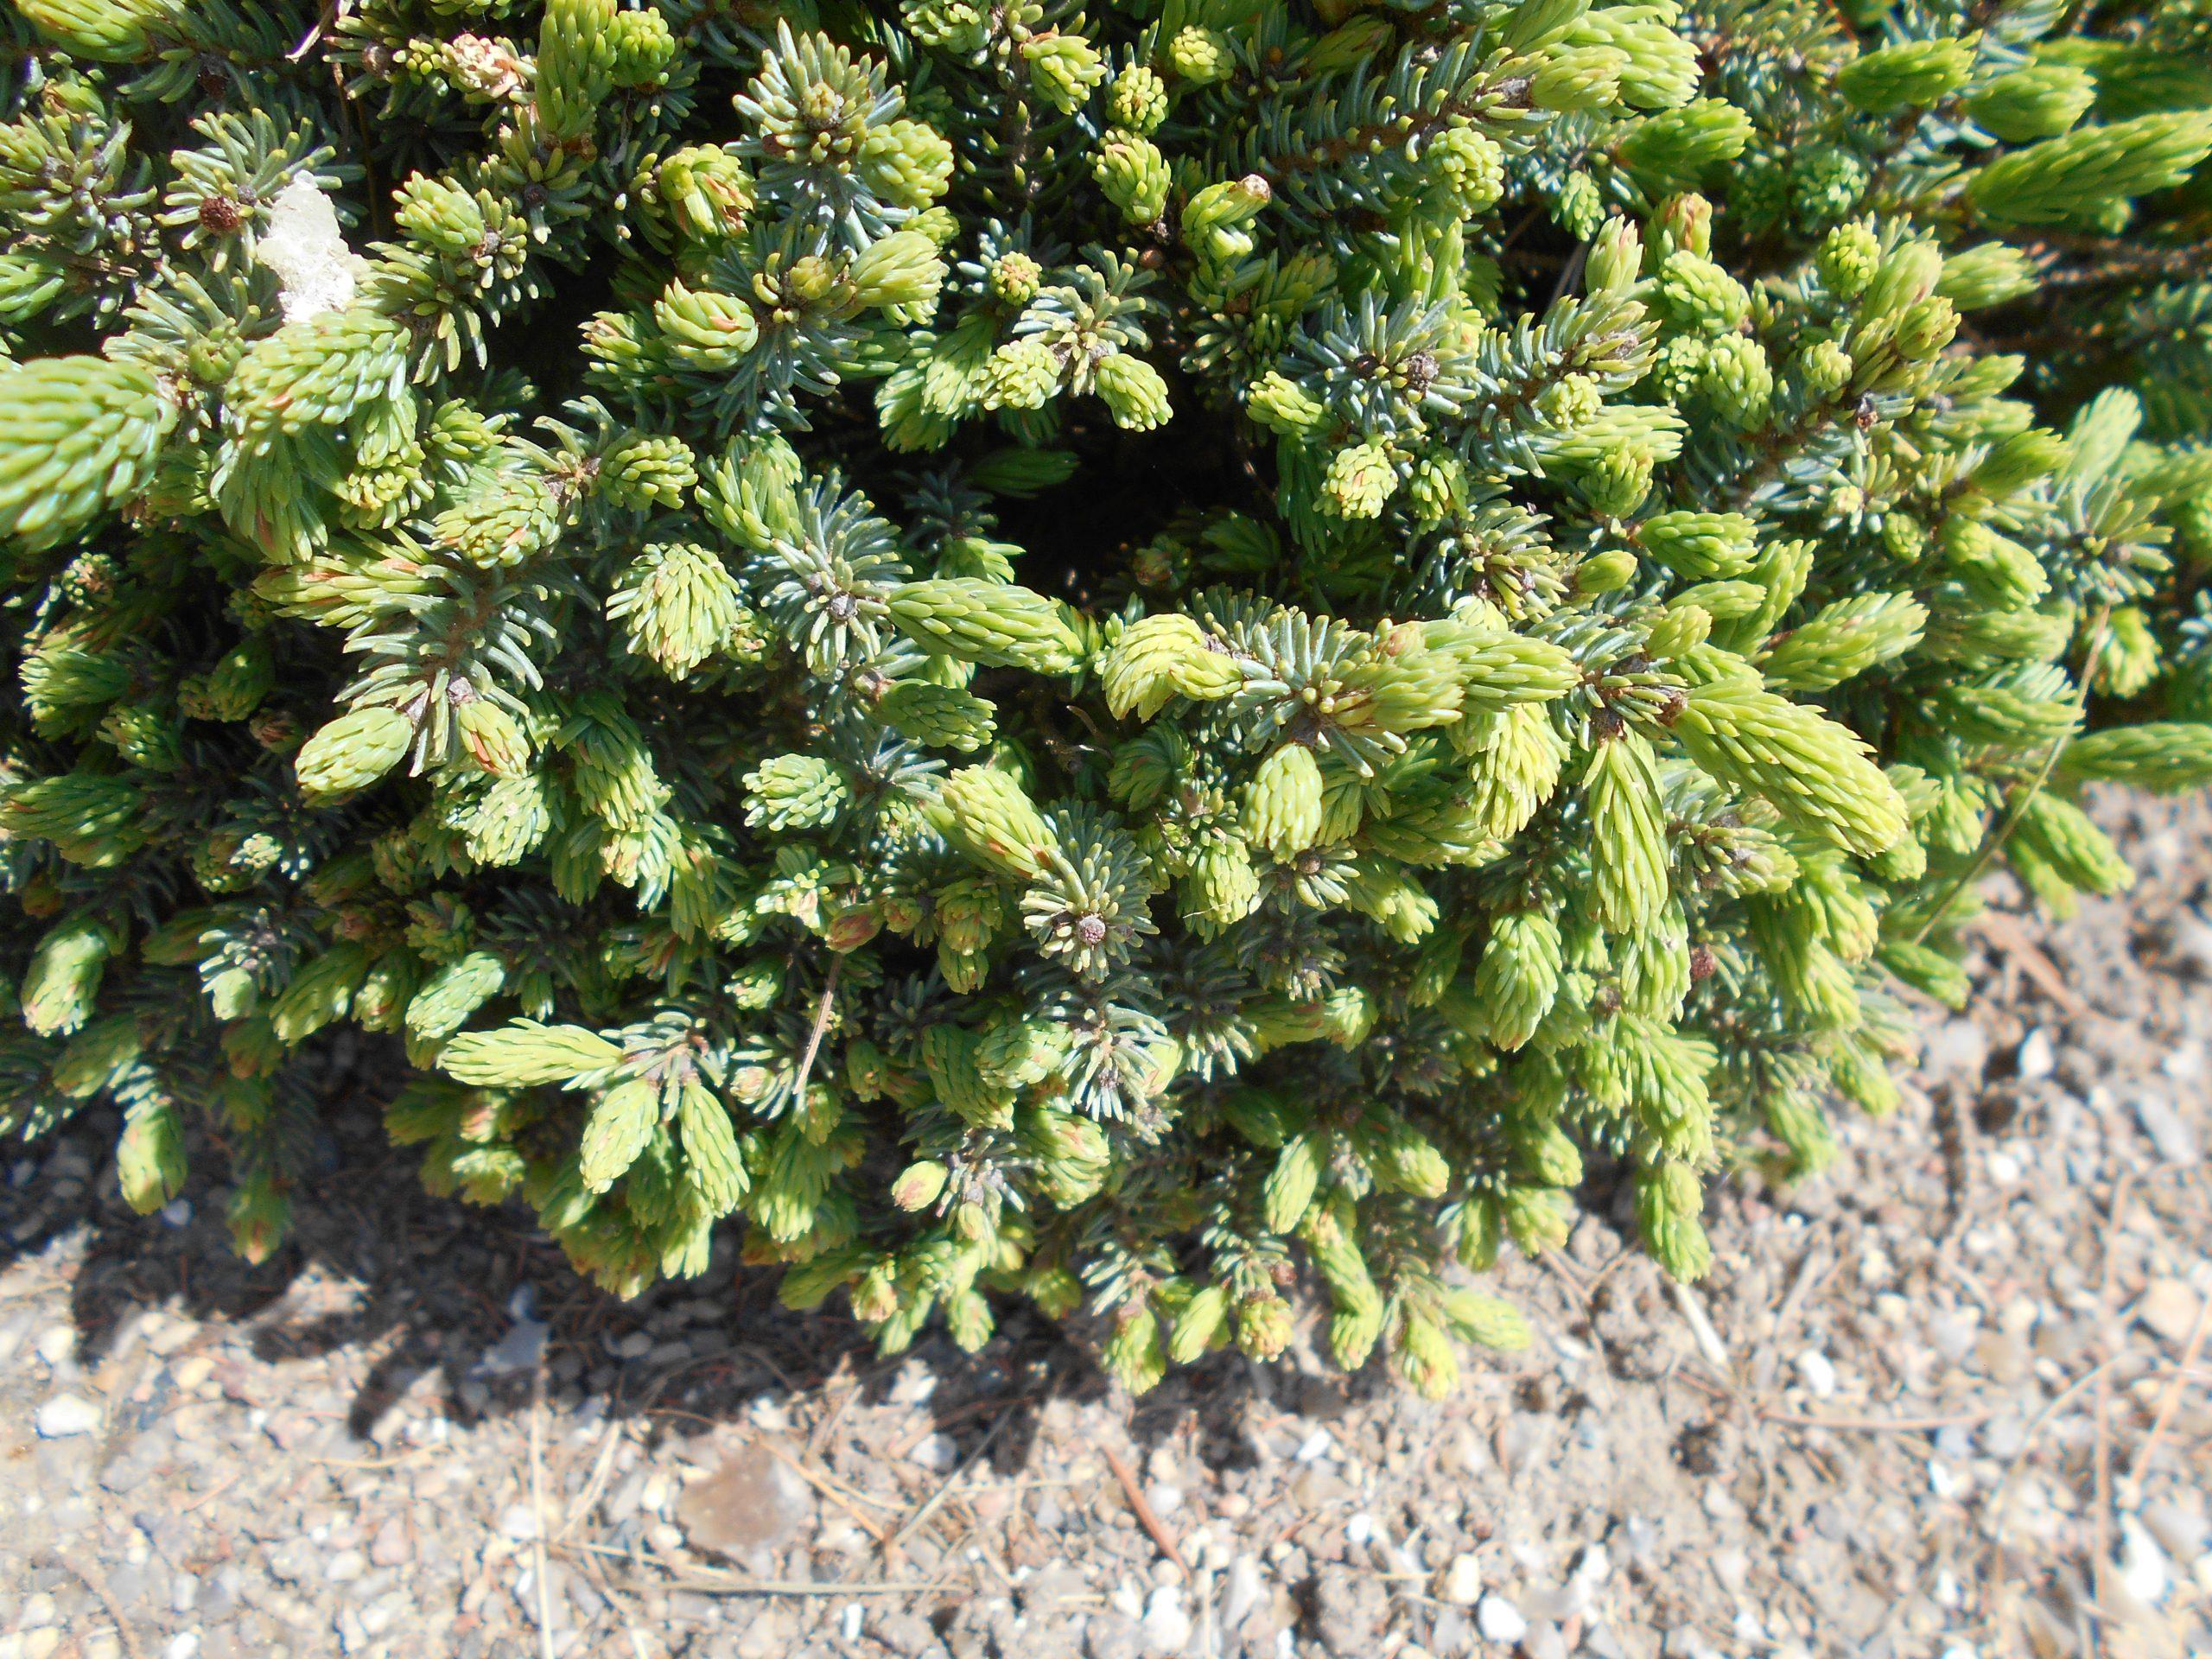 Smrek biely Picea glauca Echiniformis